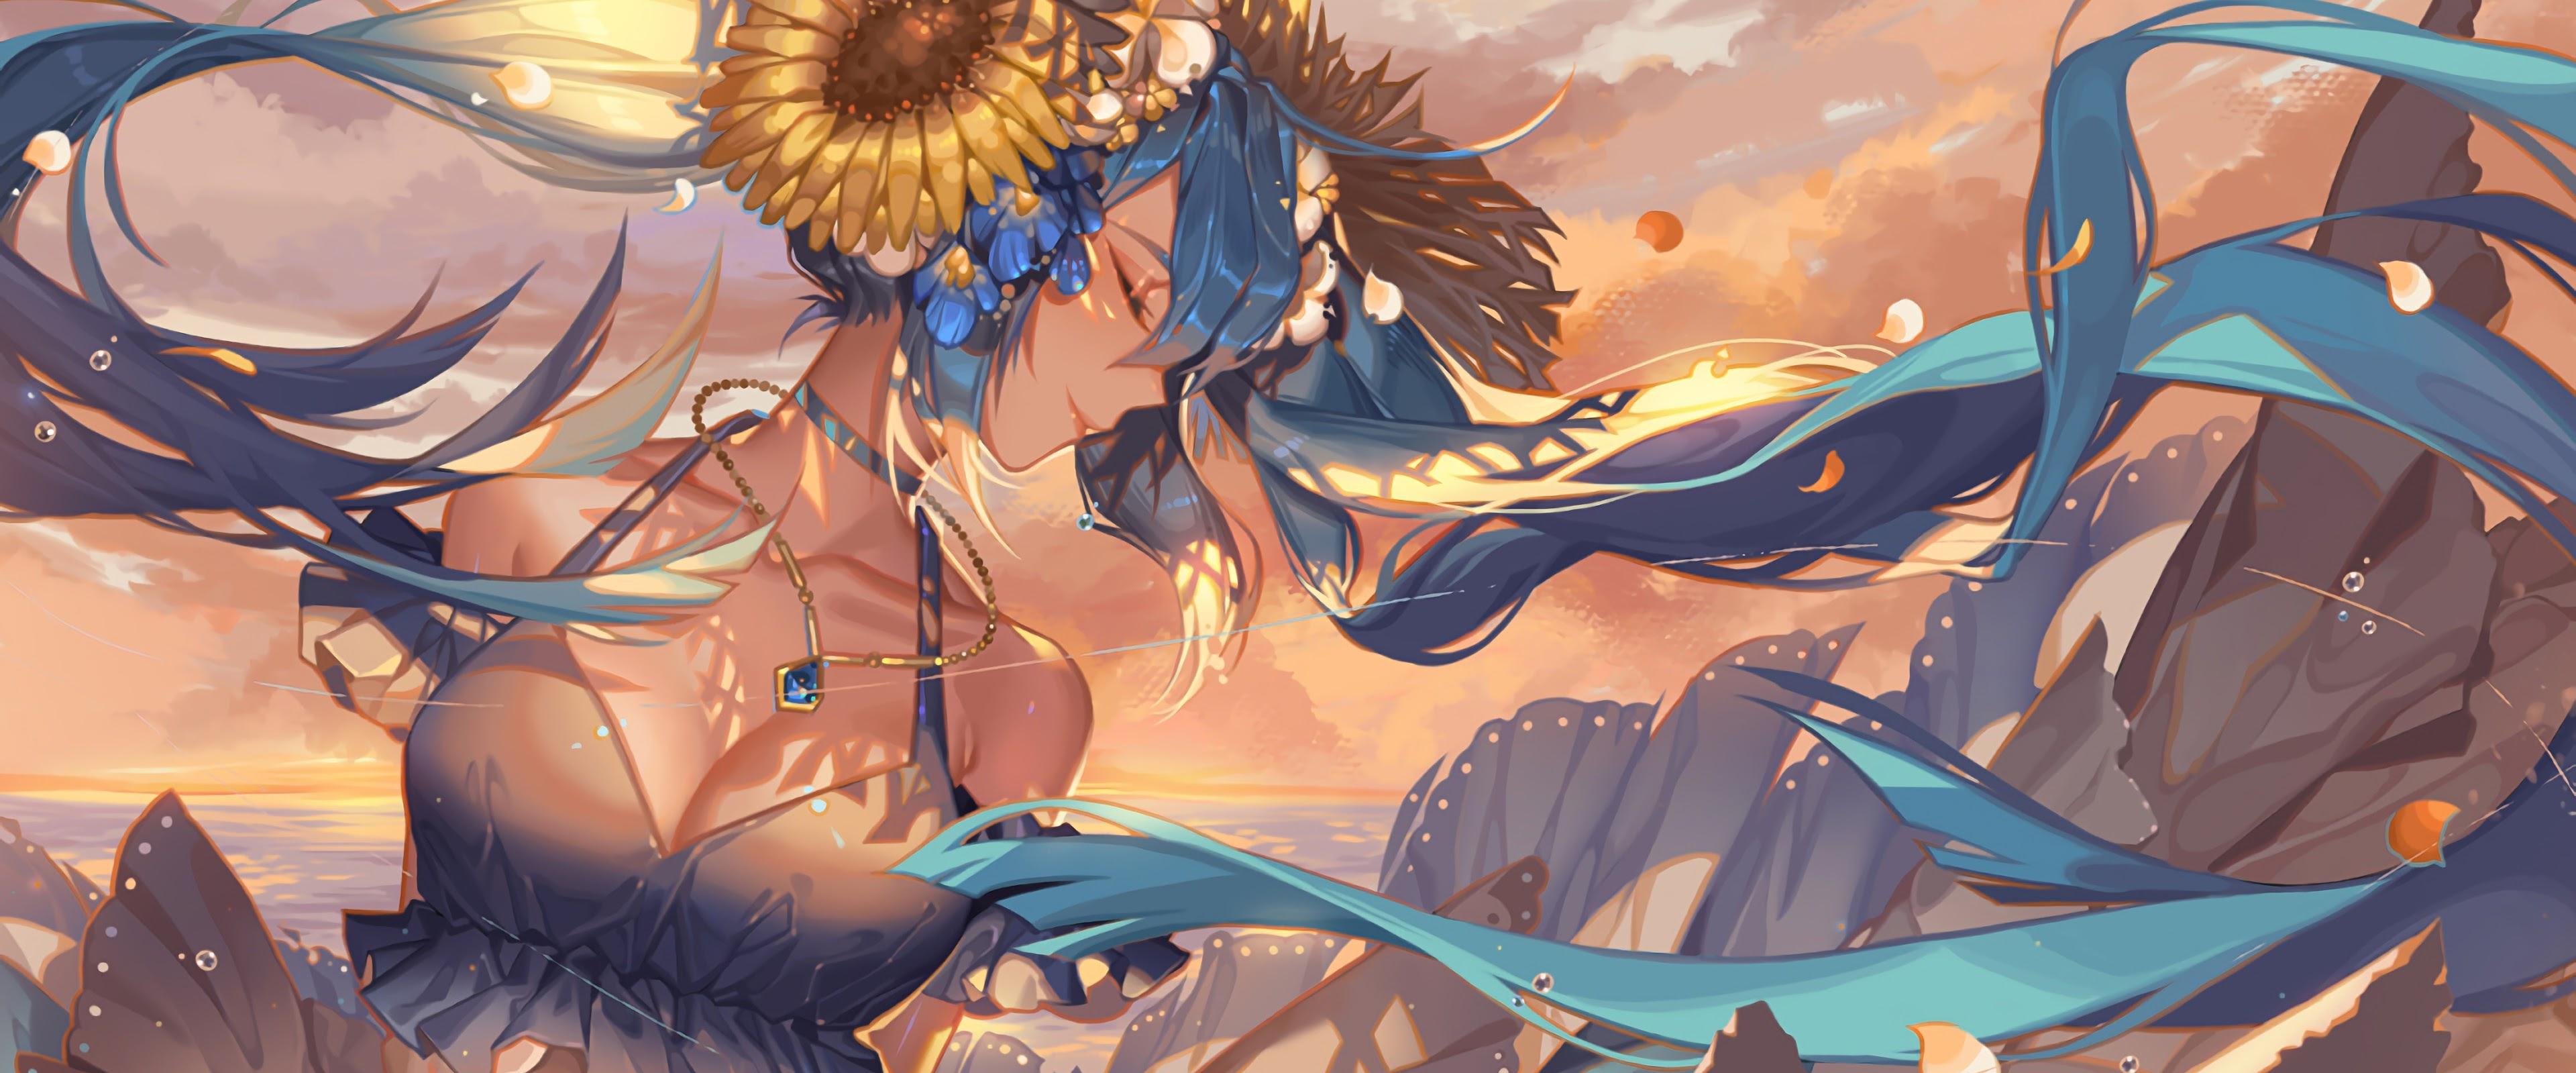 Hatsune Miku, Anime, Girl, 4K, #152 Wallpaper